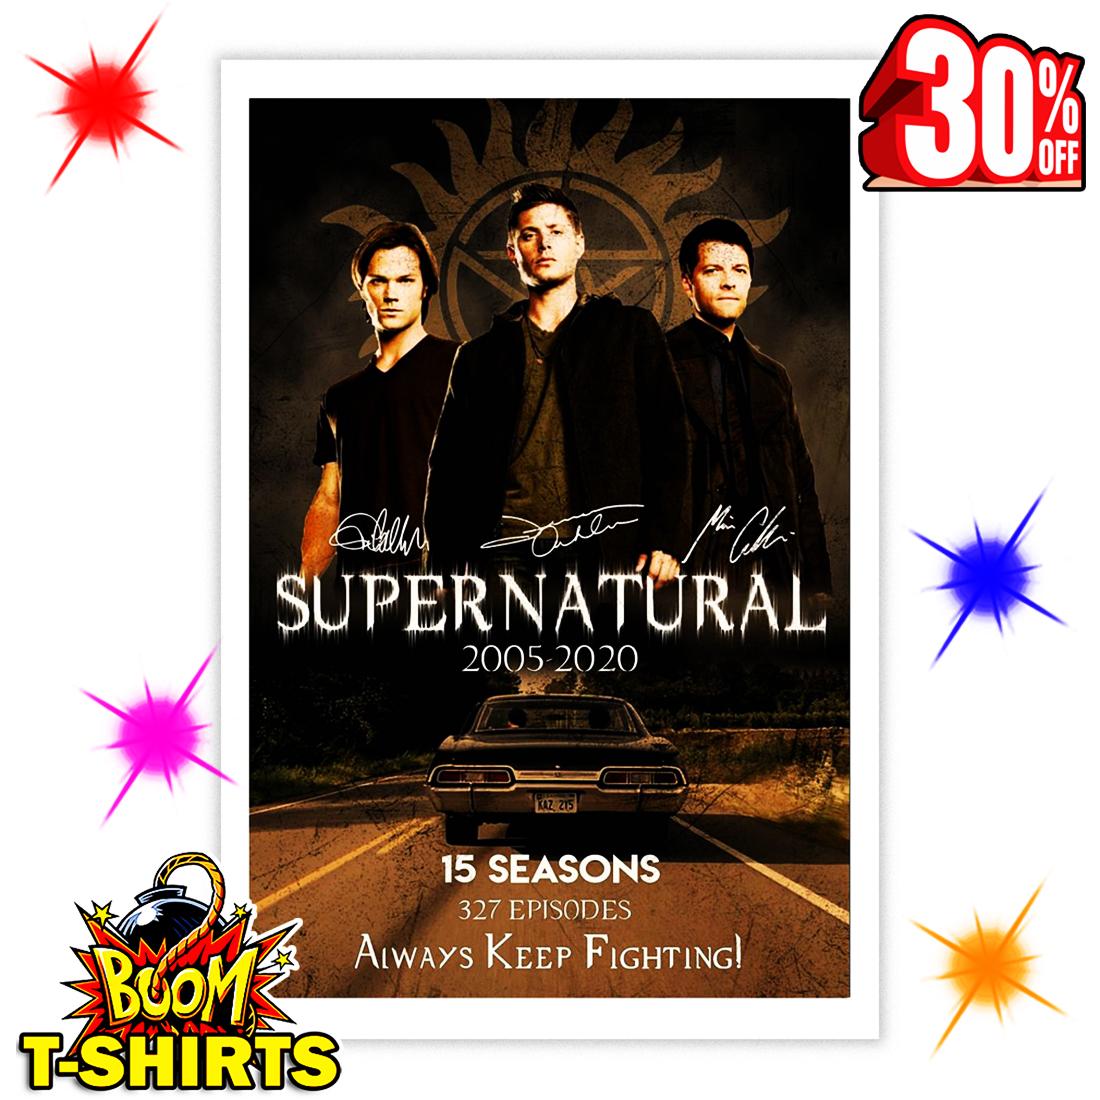 Supernatural 15 Seasons 327 Episodes Always Keep Fighting Signature Poster